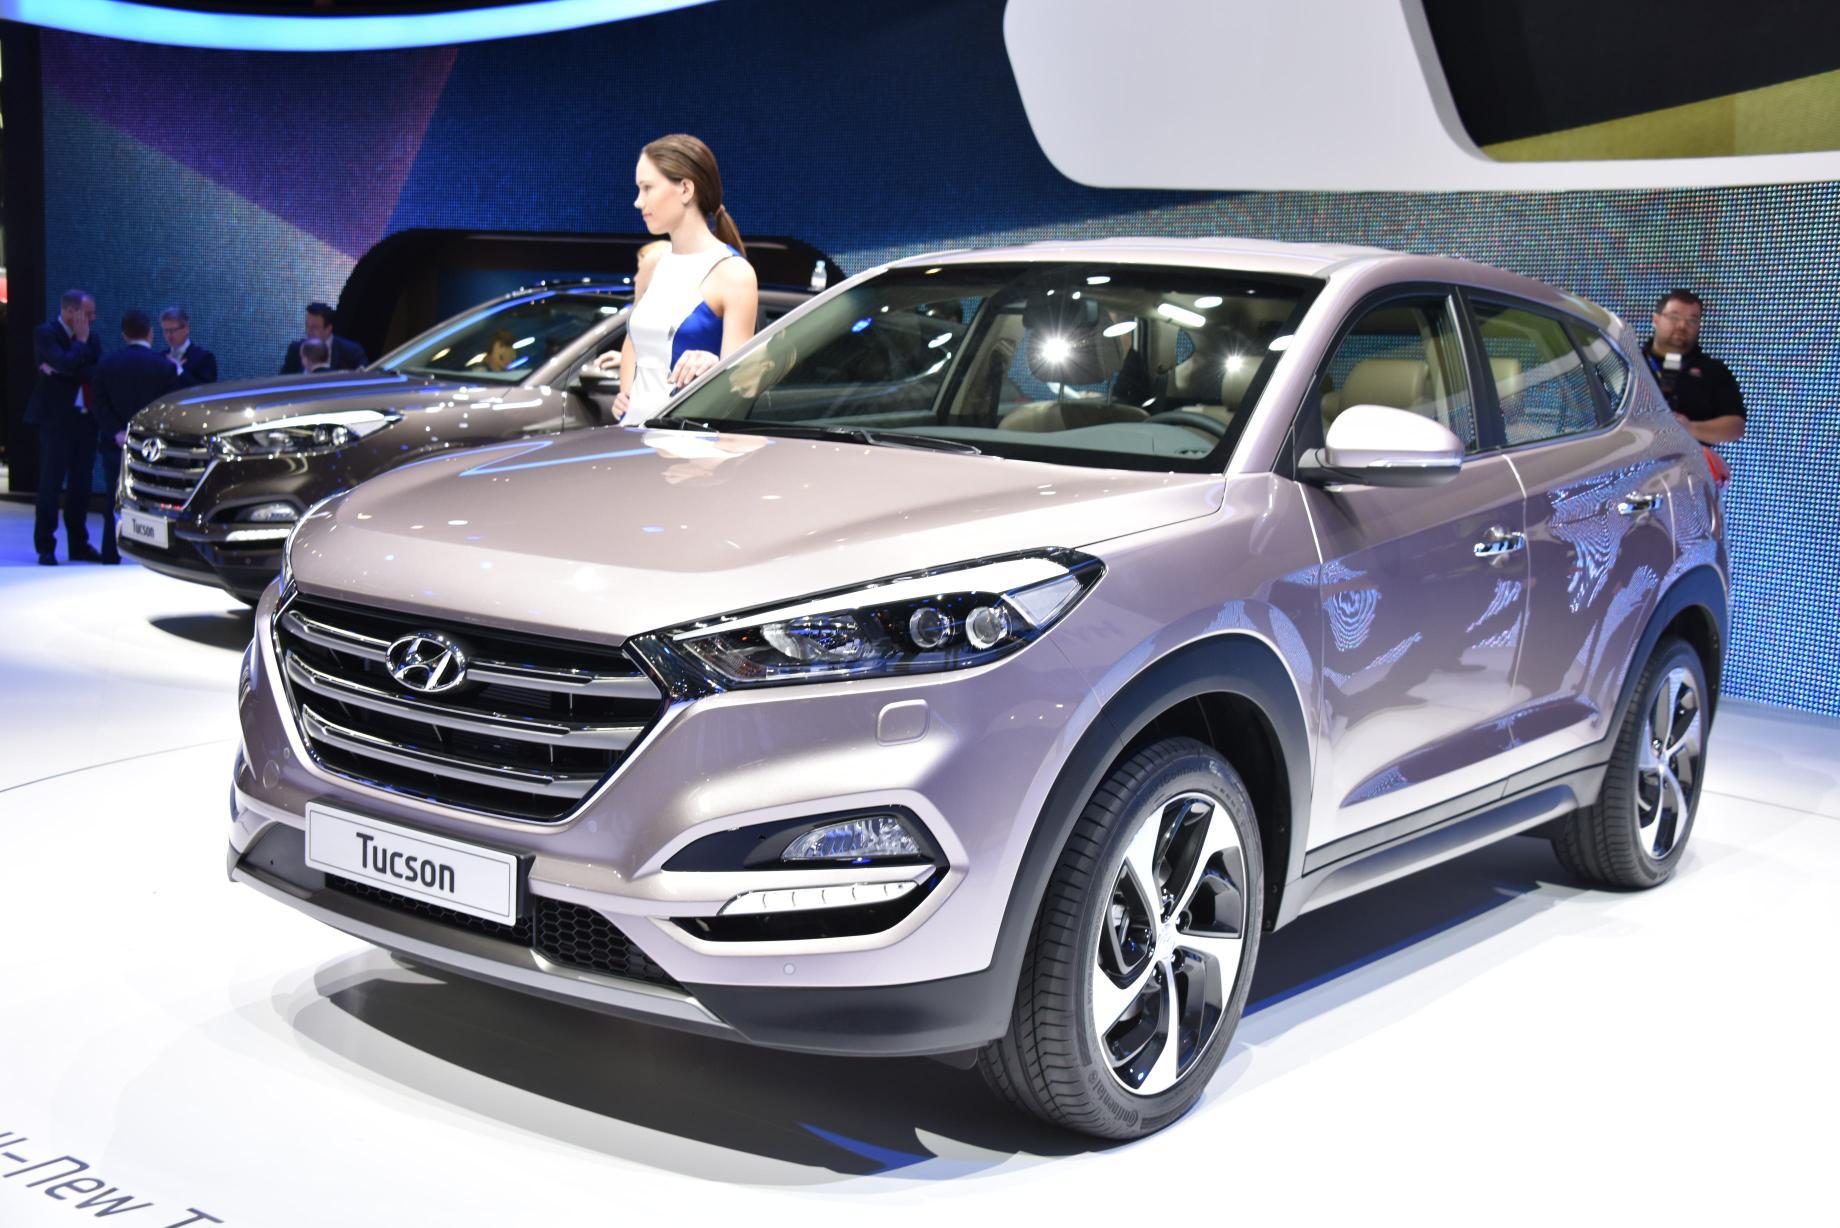 2015 Hyundai Sonata Hybrid >> 2016 Hyundai Tucson Debuts in Geneva with 48V Hybrid and PHEV Engines - autoevolution